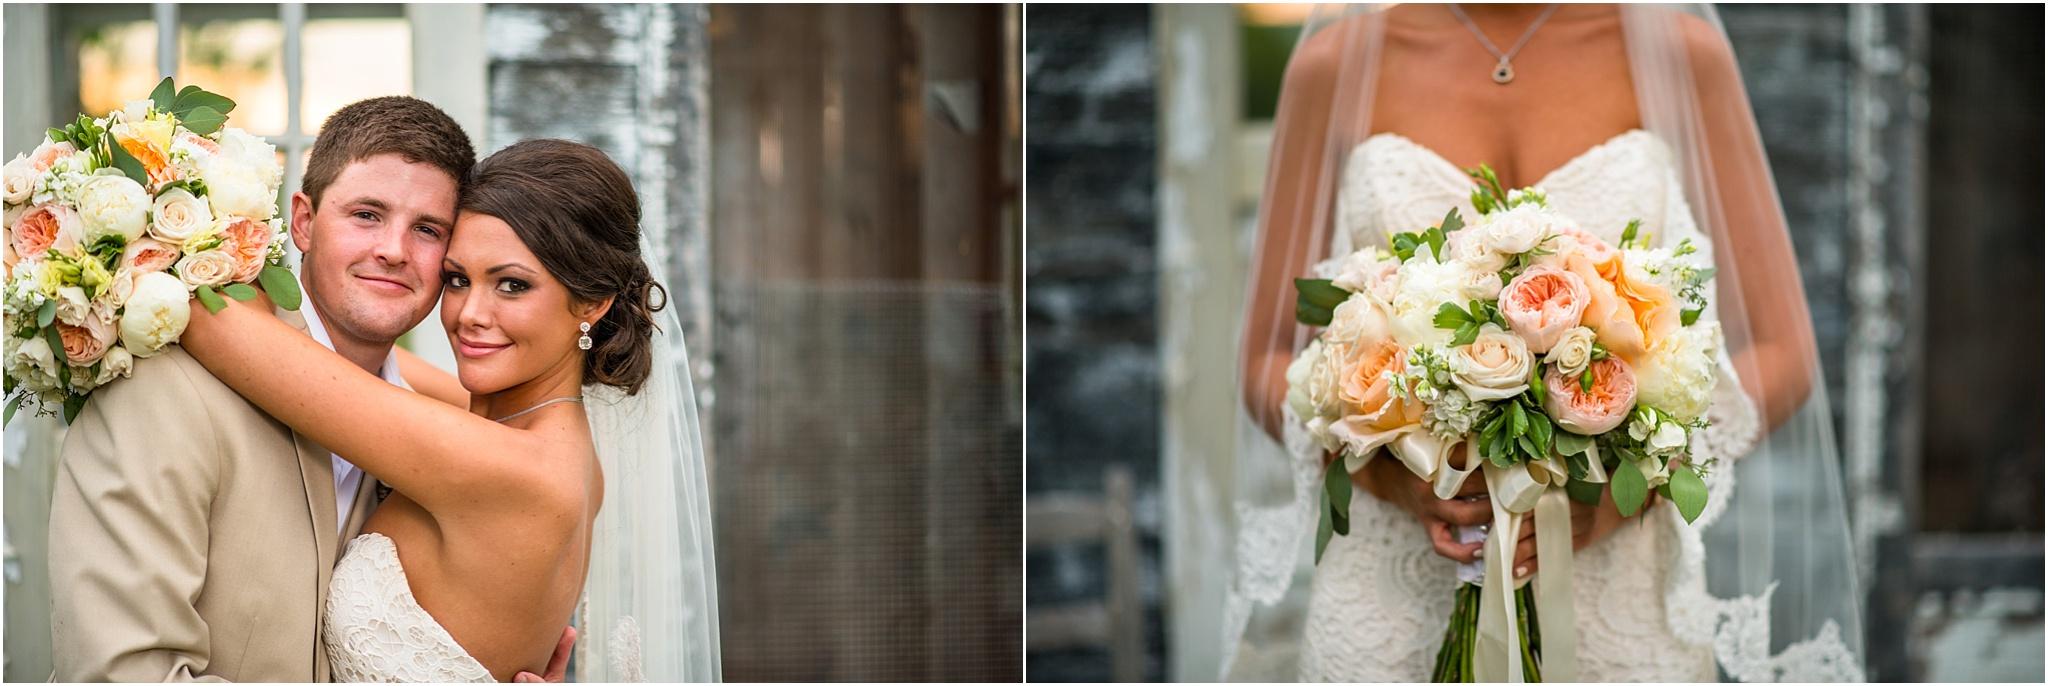 Greg Smit Photography Nashville wedding photographer Mint Springs Farm 19